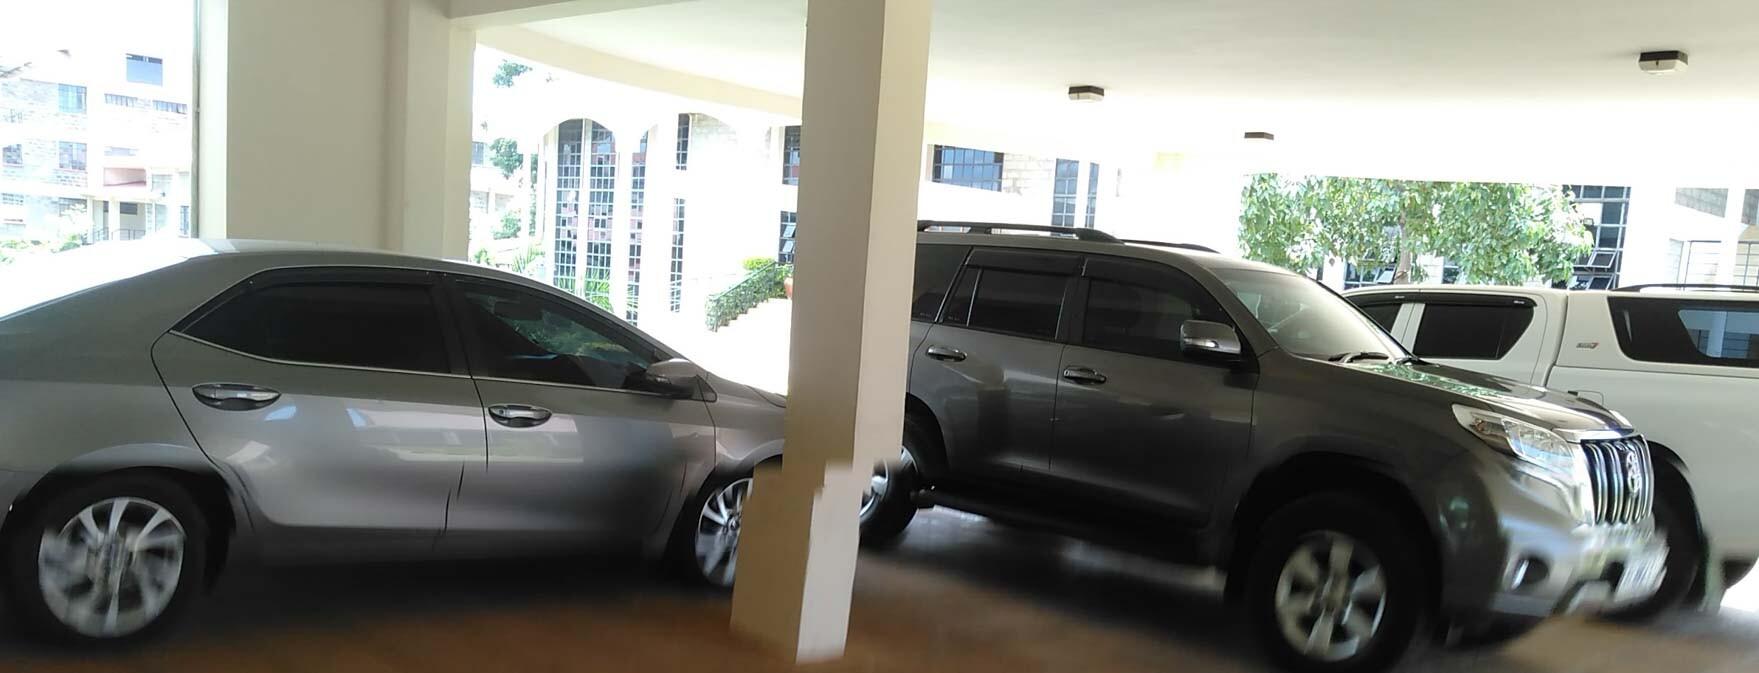 Vehicle Gallery